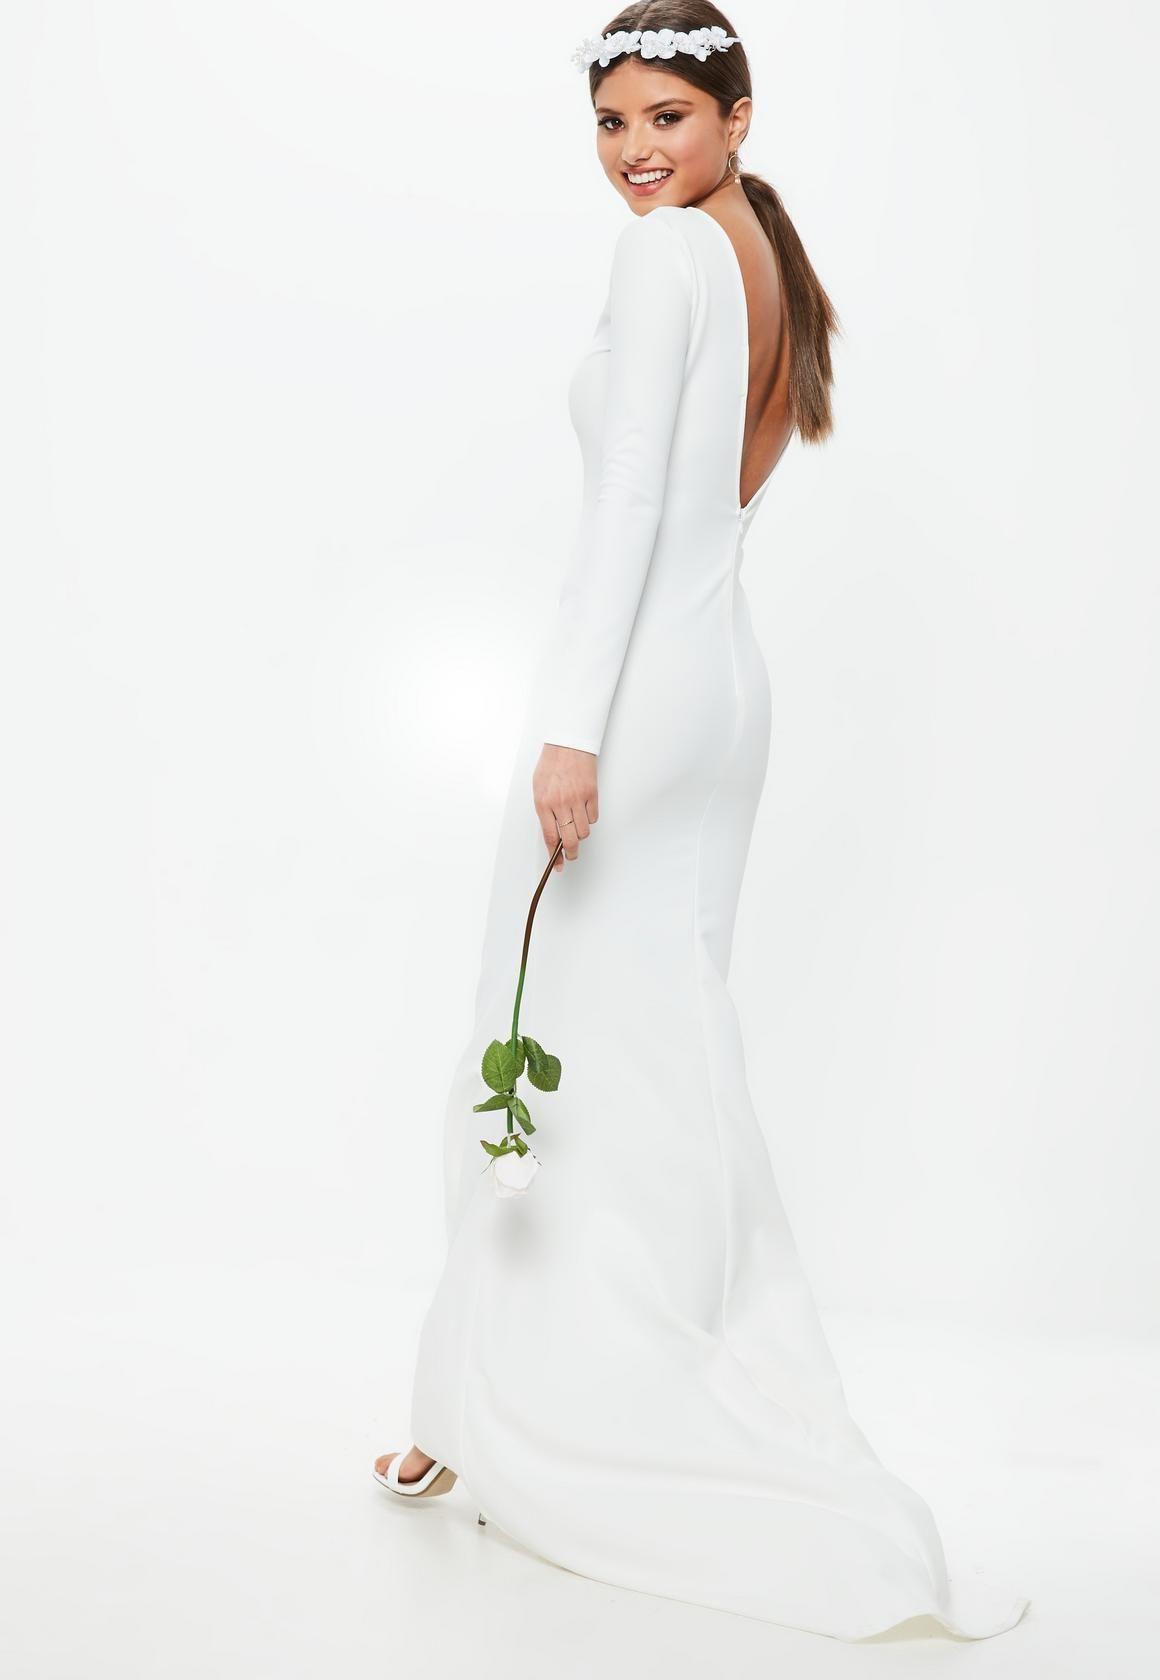 Missguided Bridal White Long Sleeve Open Back Fishtail Dress Affordable Wedding Dresses Inexpensive Bridesmaid Dresses Affordable Bridesmaid Dresses